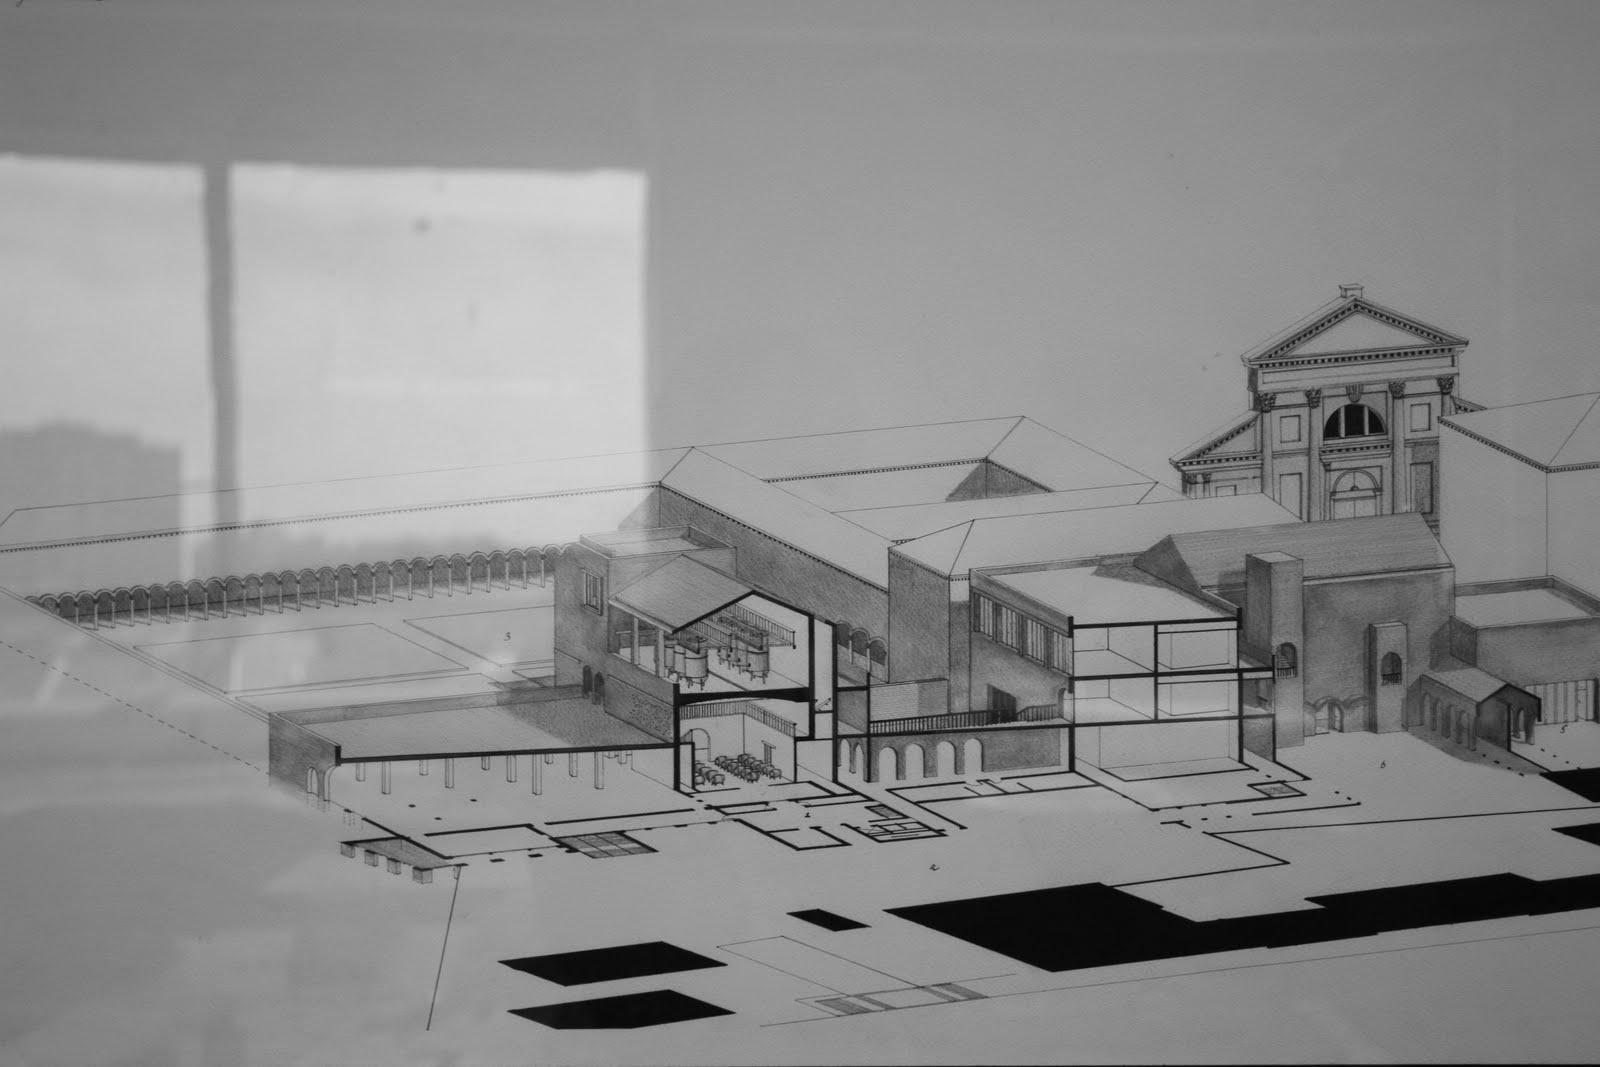 Ljmu school of architecture manchester school of for J j school of architecture